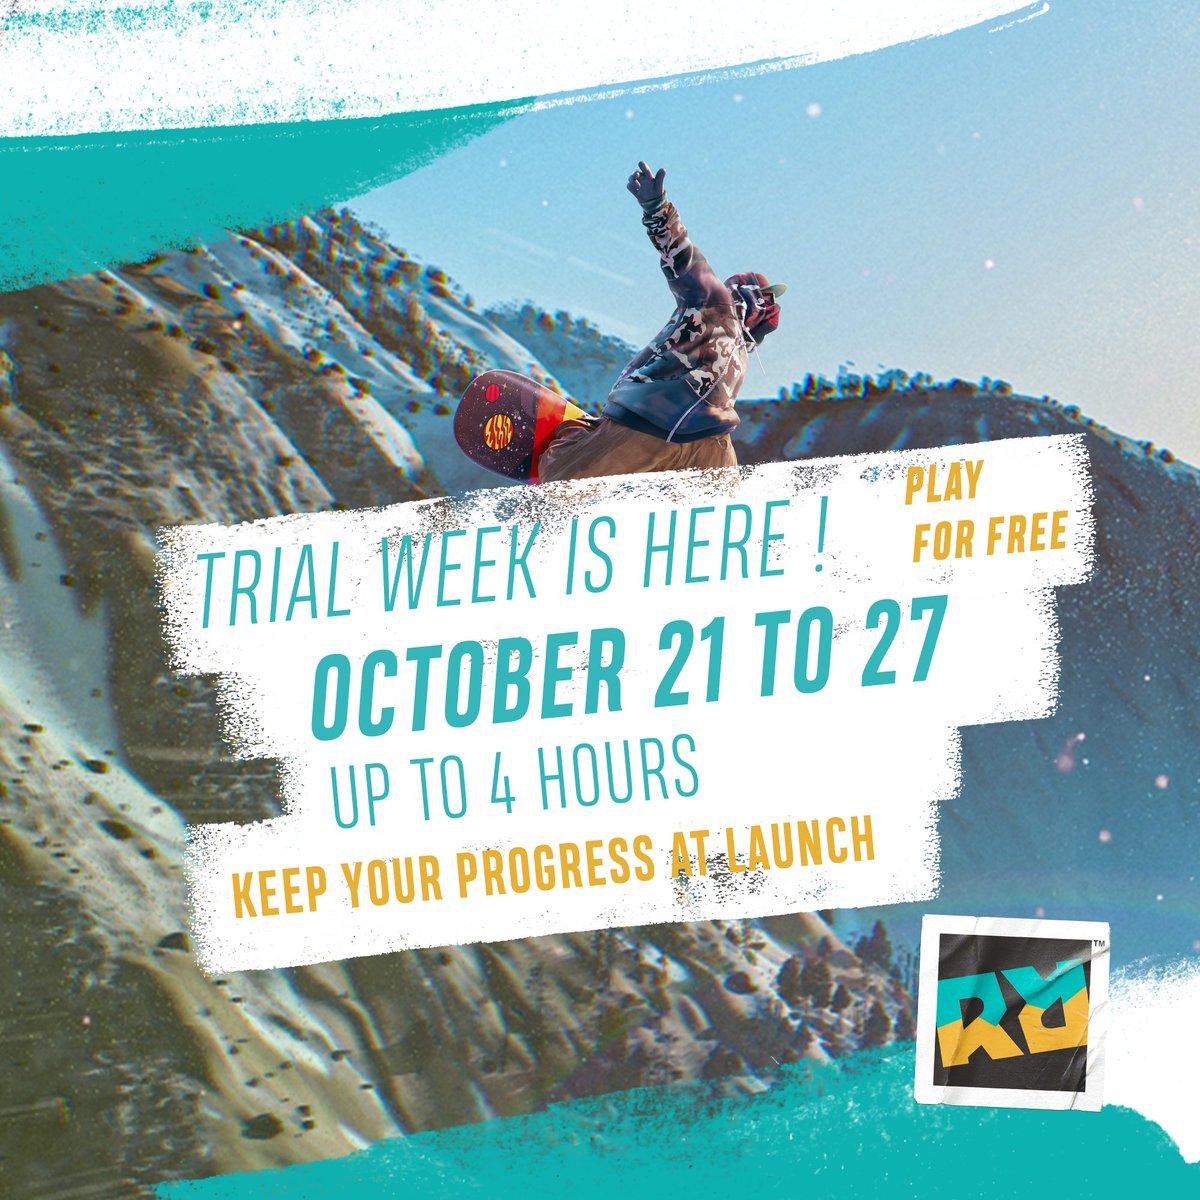 Fellow Riders, unleash the madness ⚡ Riders Republic Trial Week is open: ridersrepublic.com/trial-week